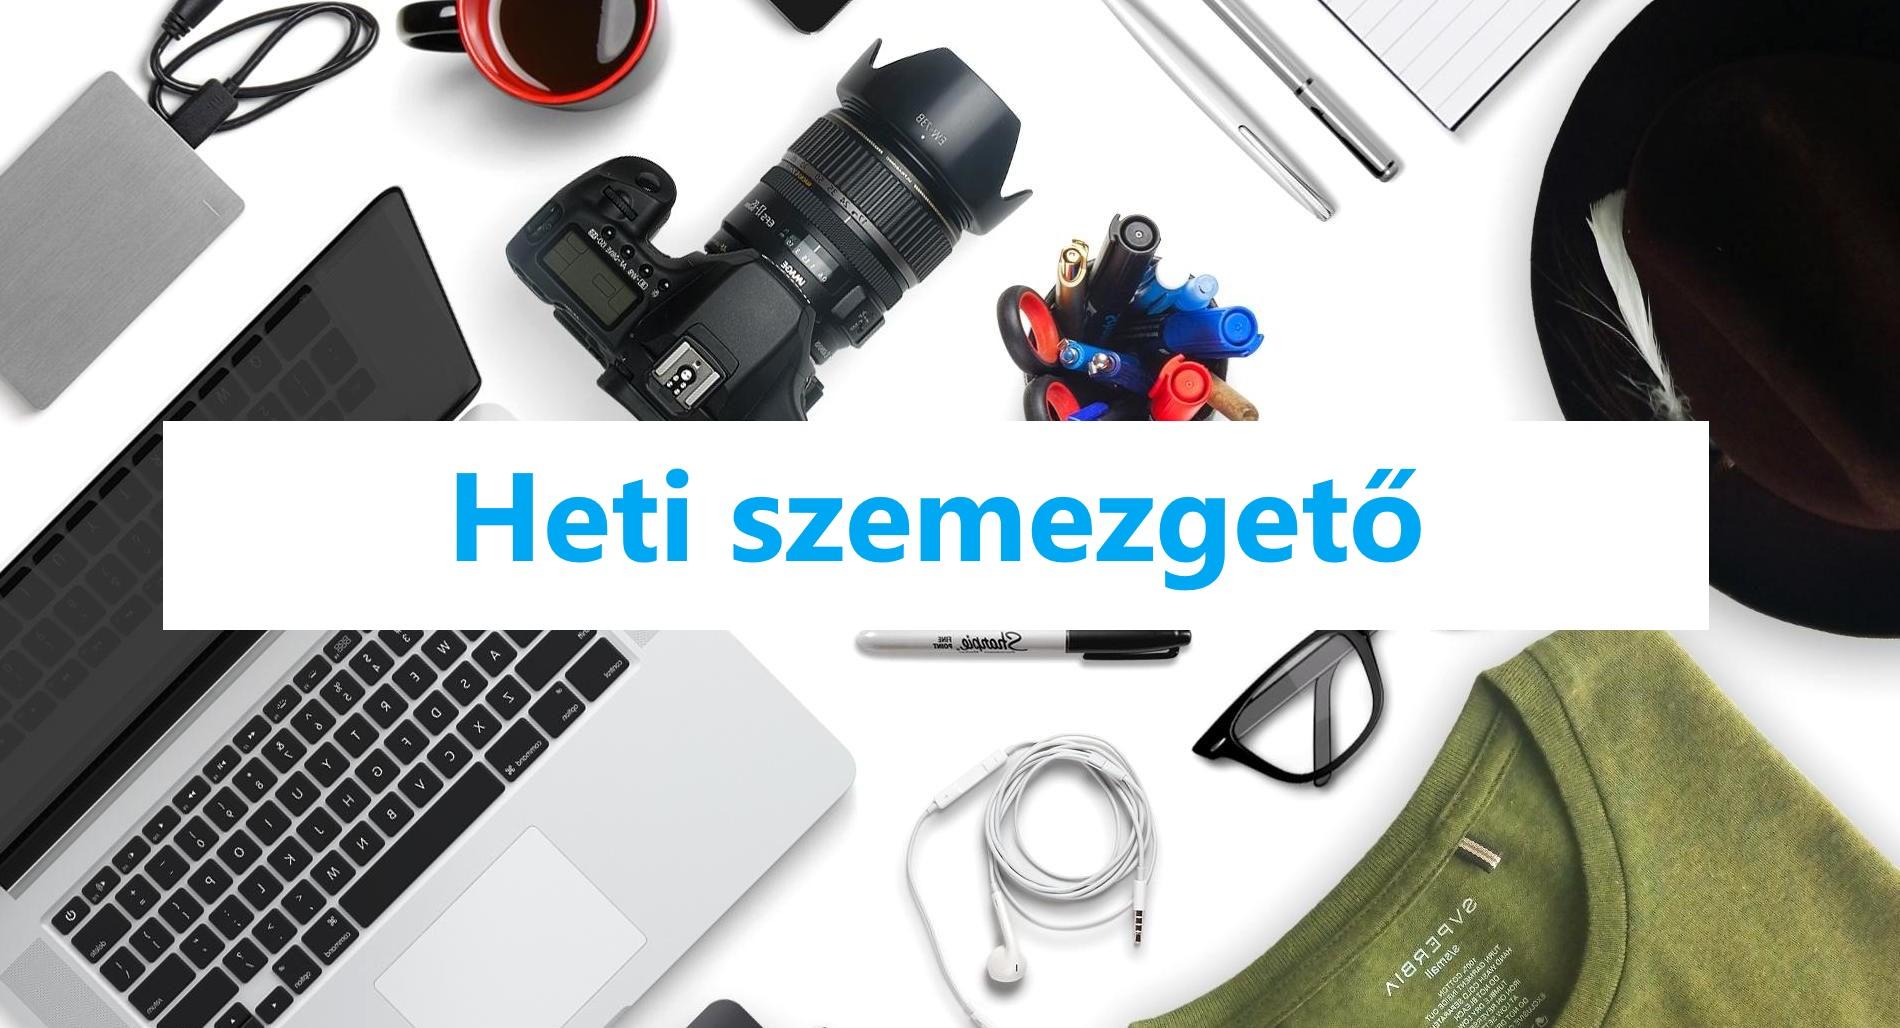 heti_szemezgeto_uj_95.jpg